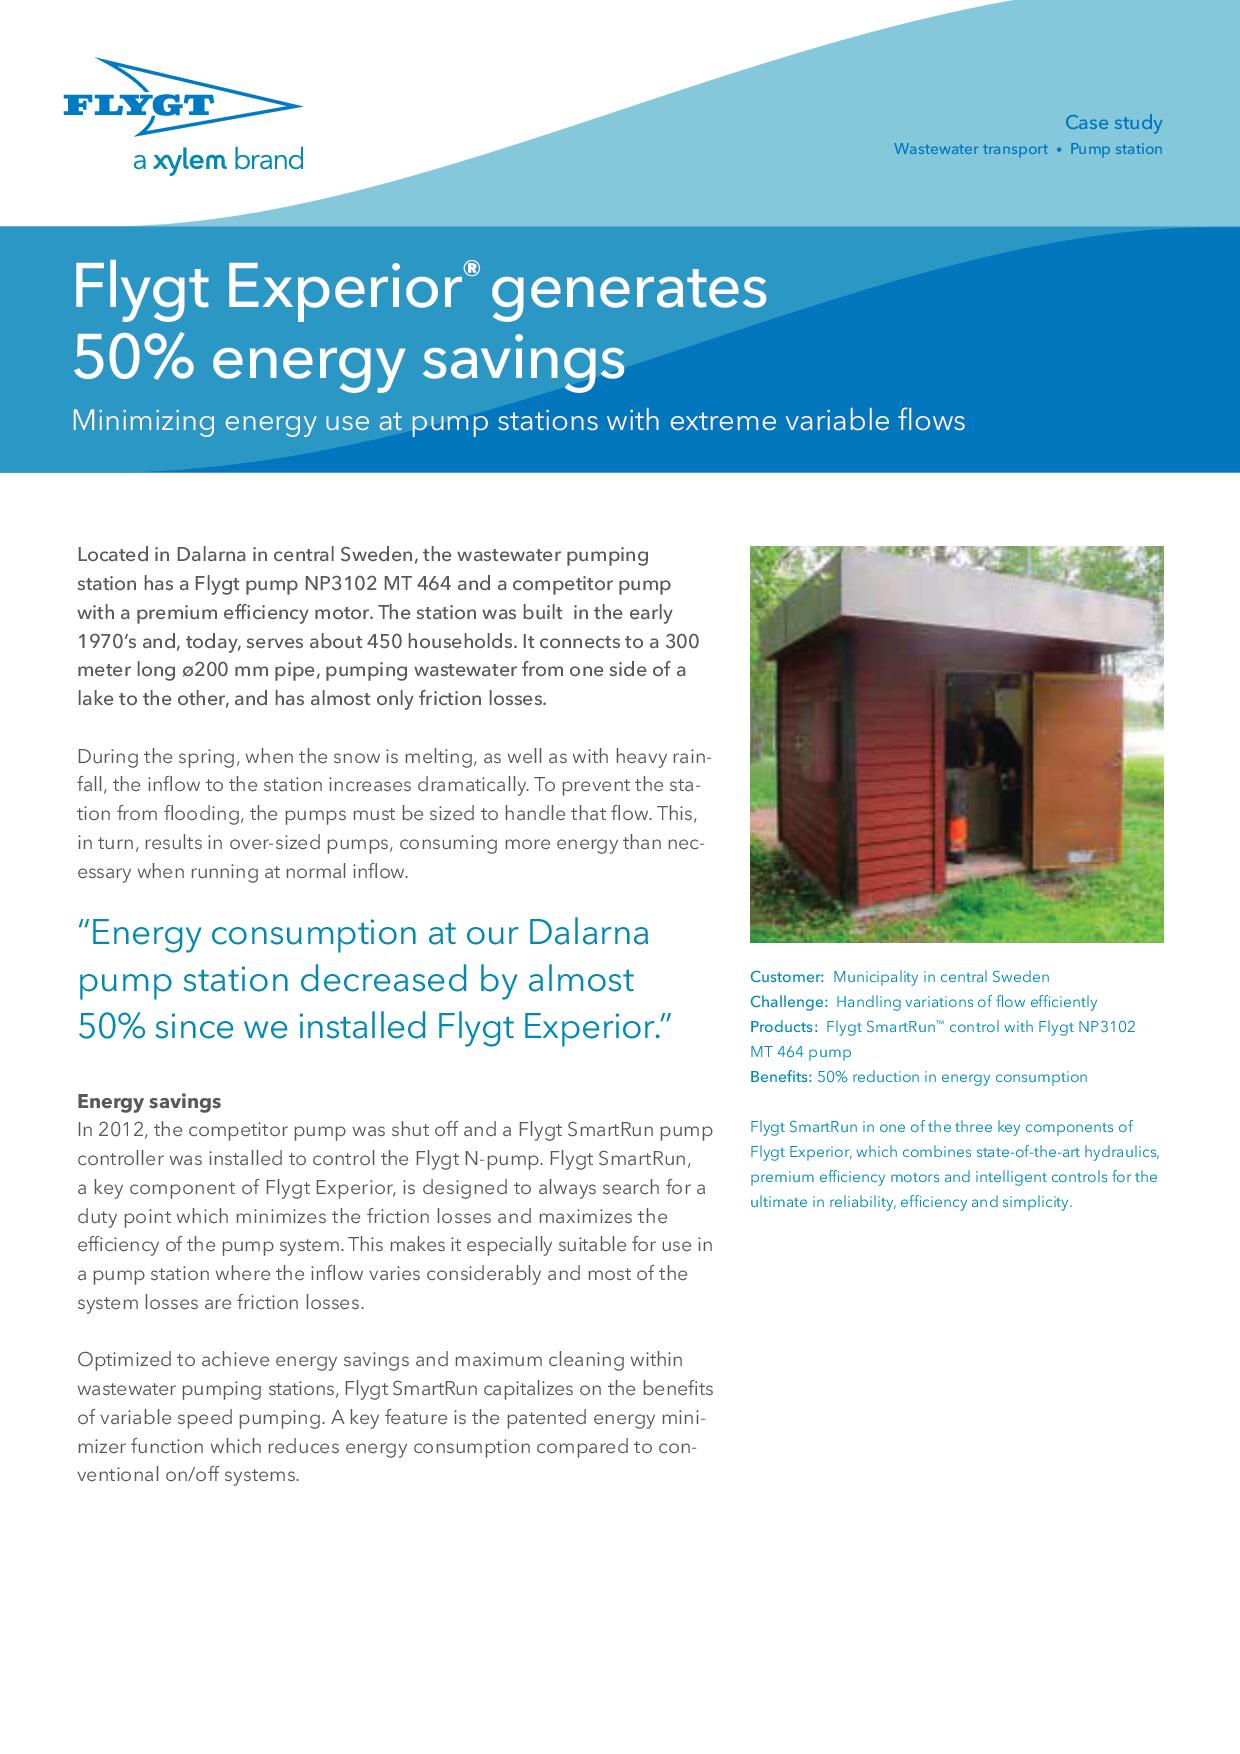 Flygt Experior generates 50% energy savings